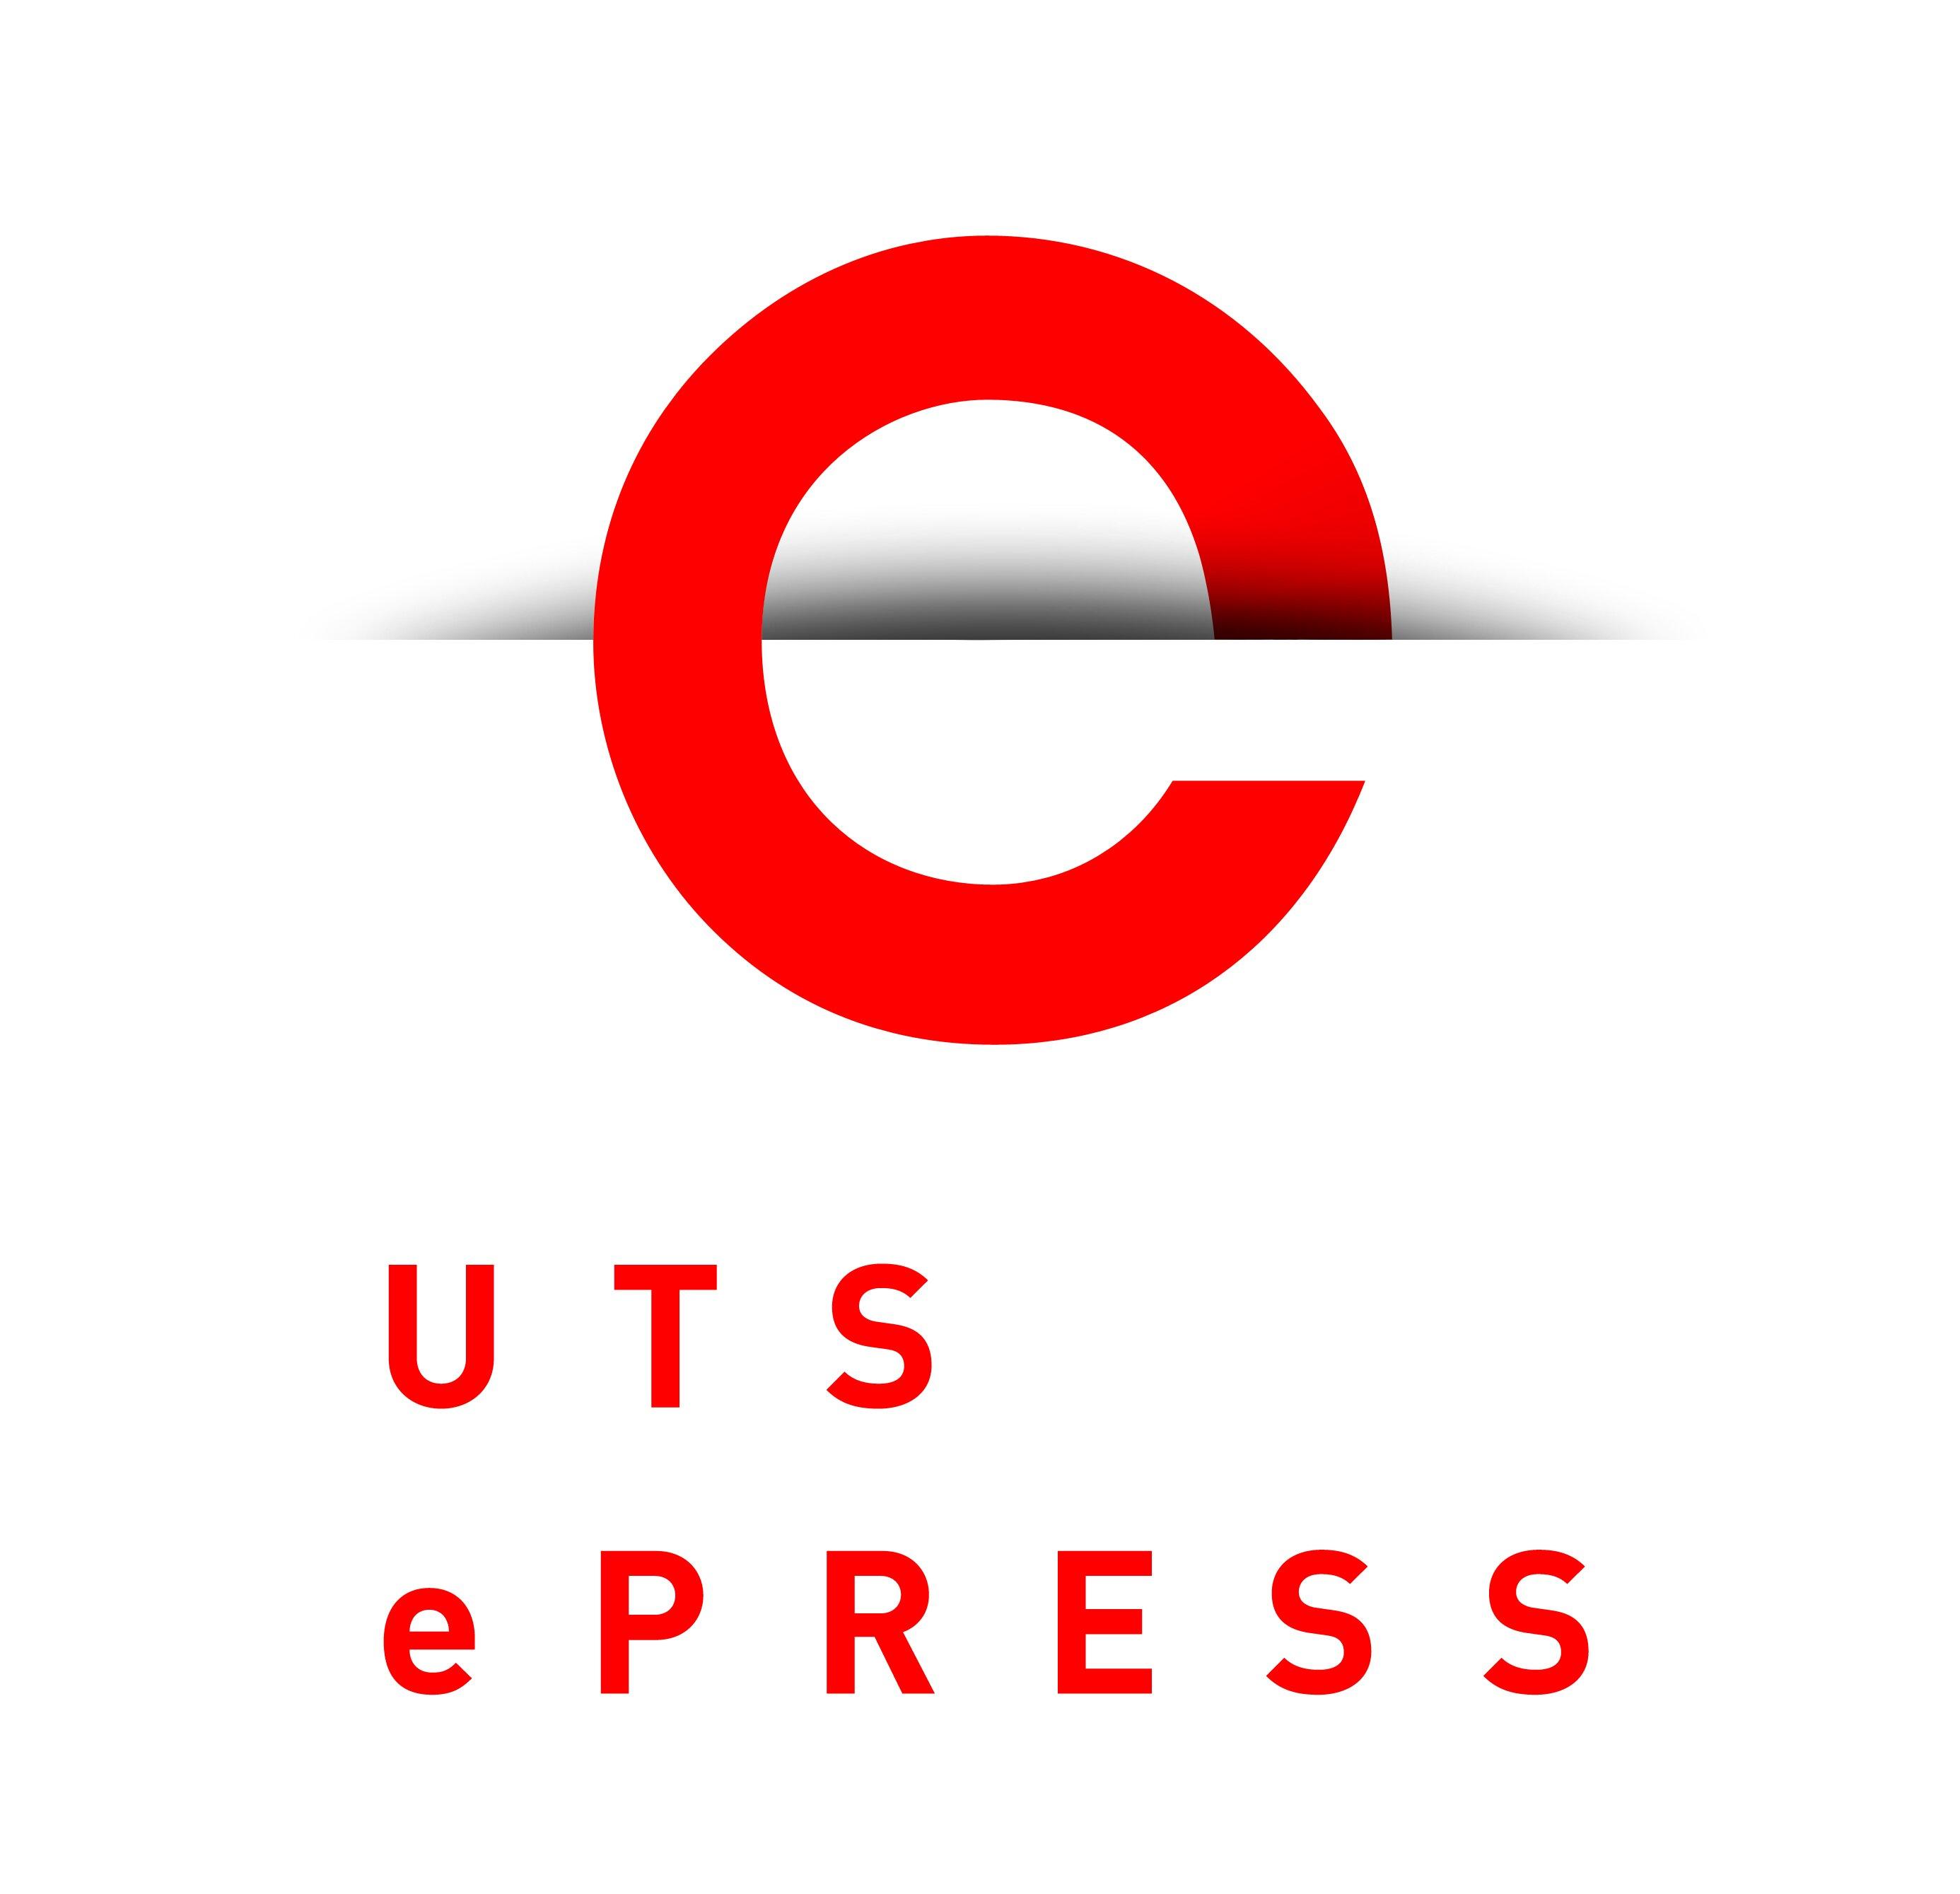 UTS ePRESS